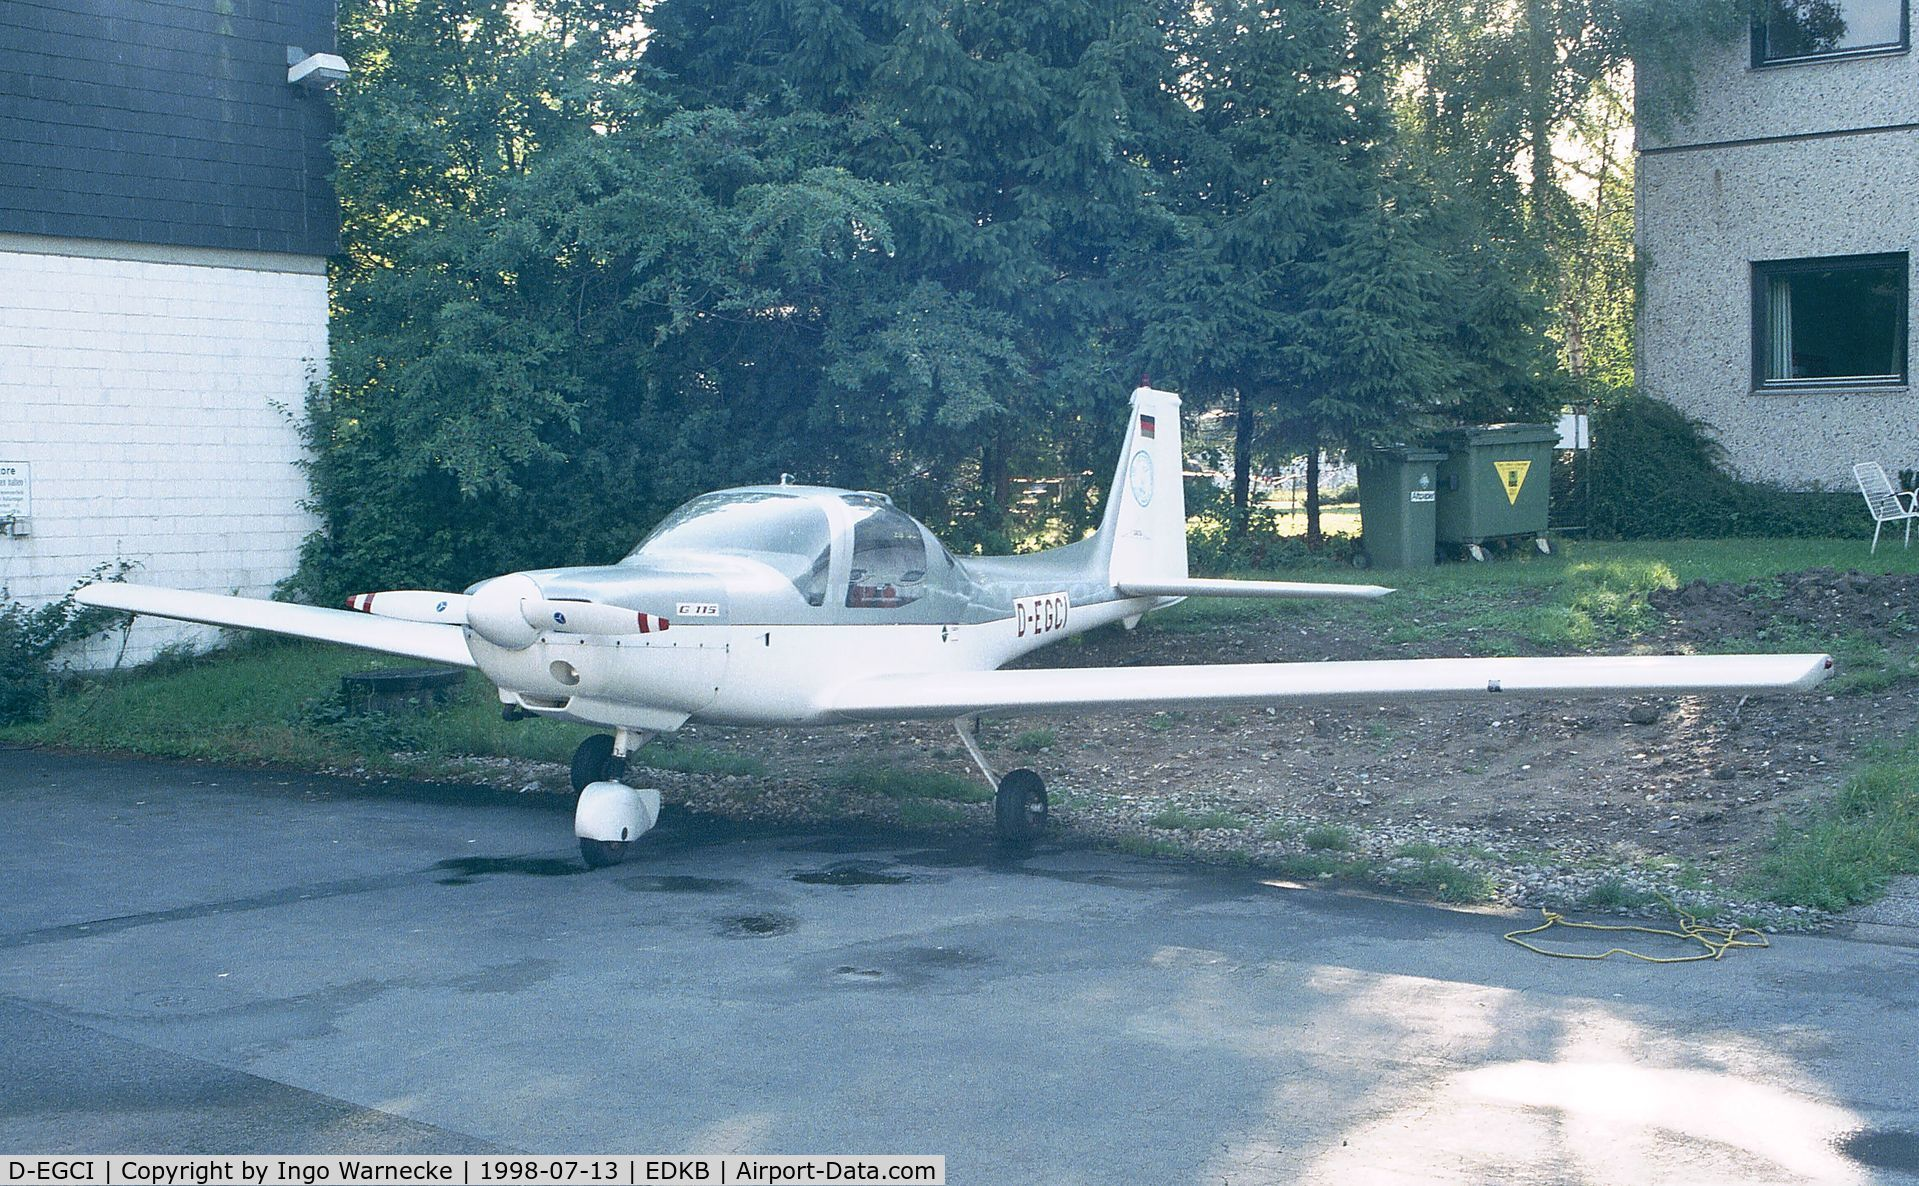 D-EGCI, 1987 Grob G-115A C/N 8015, Grob G.115A at Bonn-Hangelar airfield